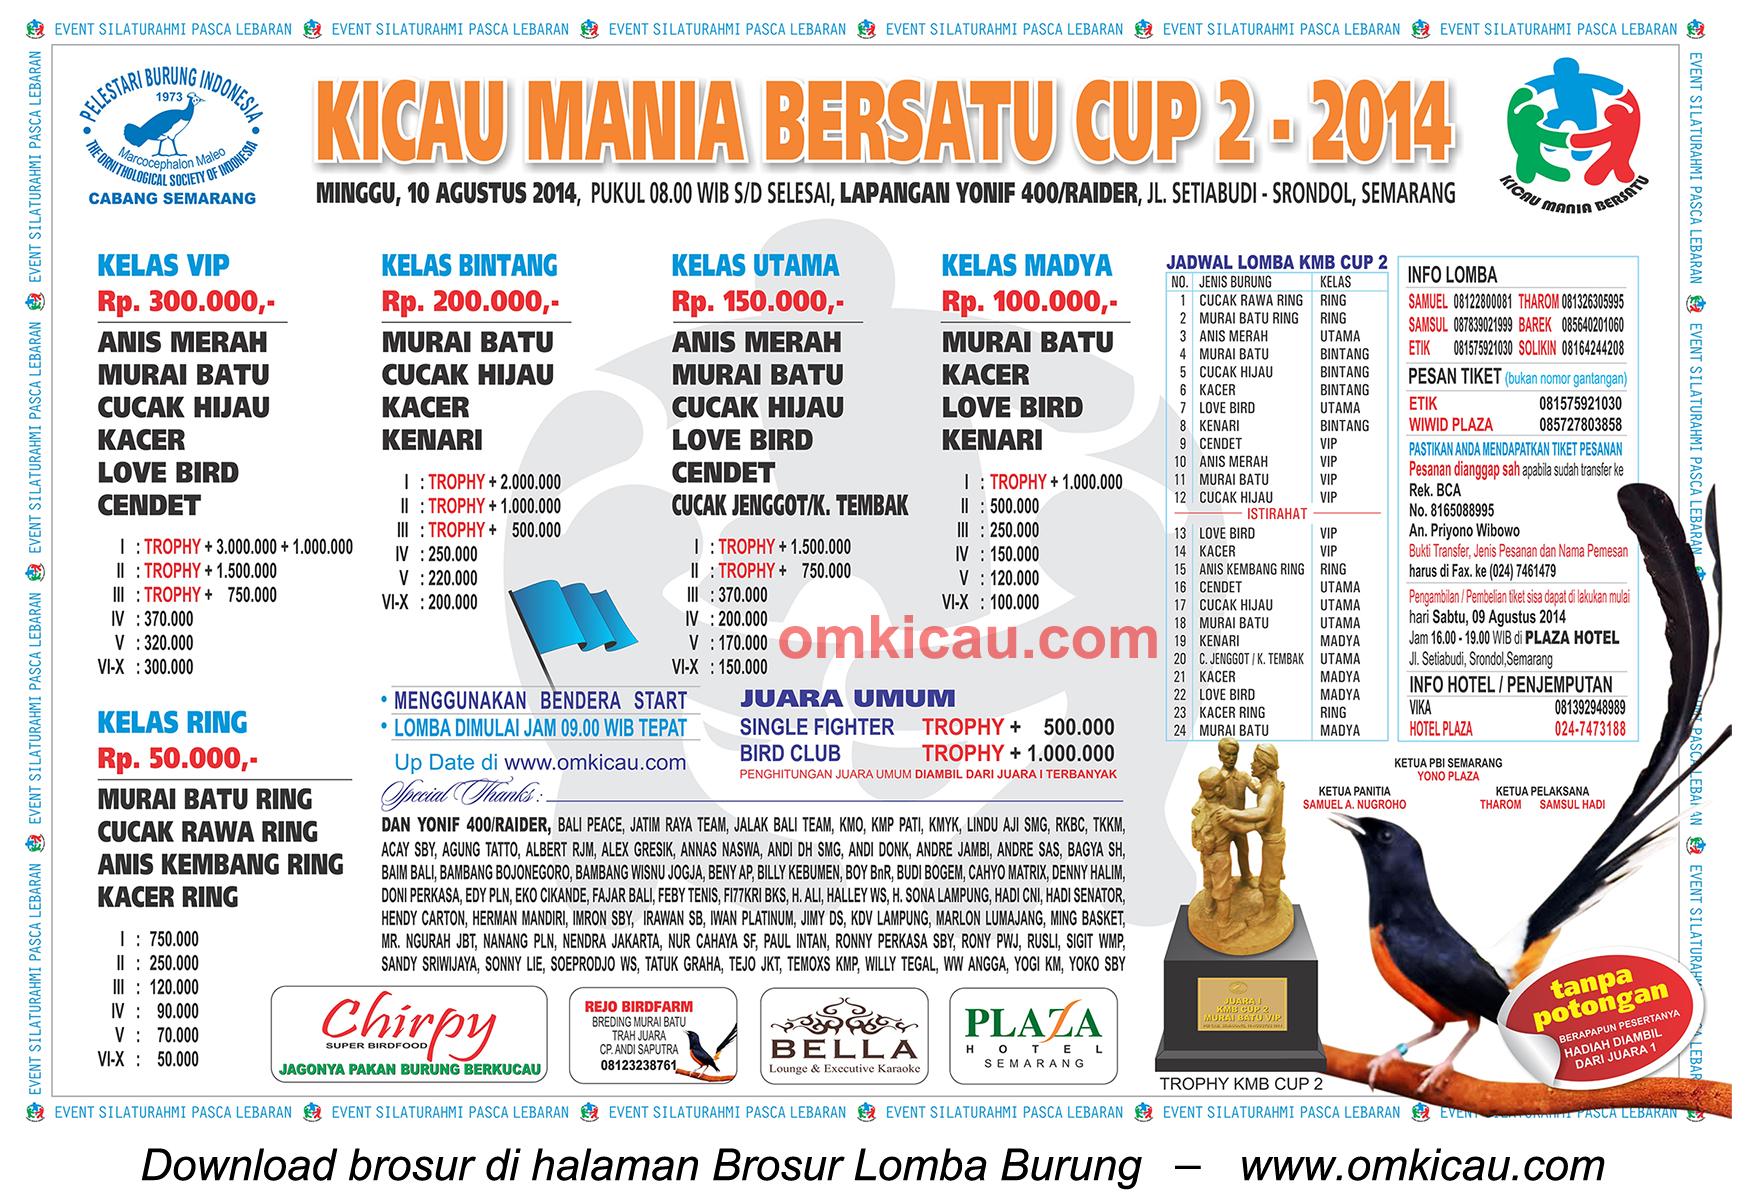 Brosur Lomba Burung Kicau Mania Bersatu Cup 2, Semarang, 10 Agustus 2014